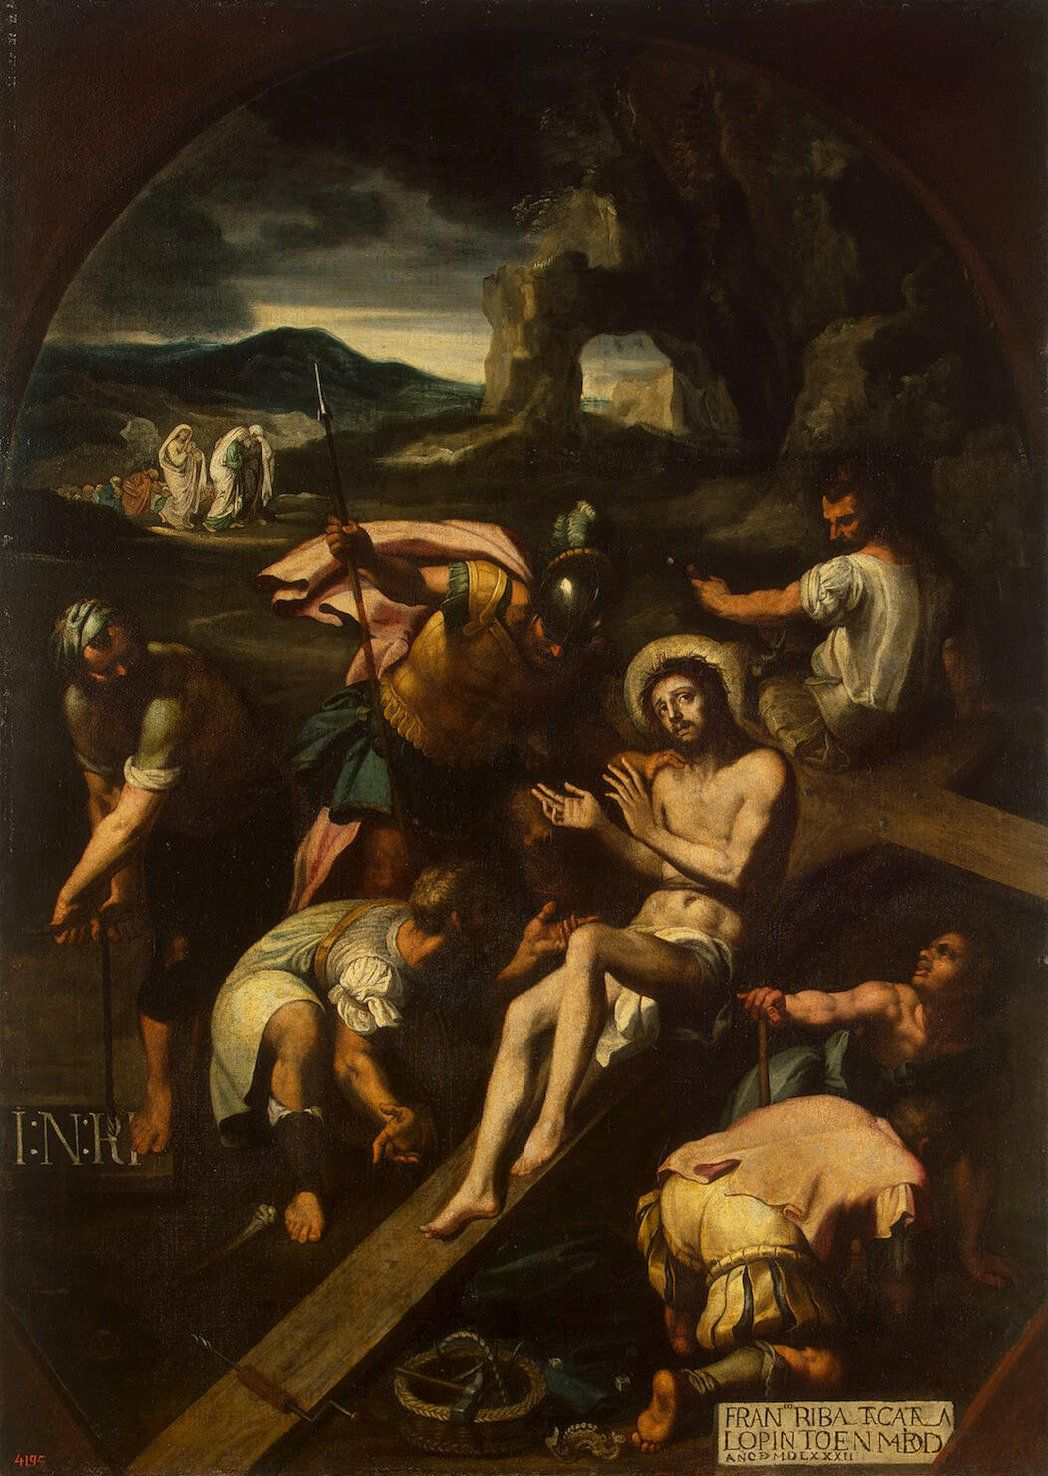 www.villadellalupa.it Francisco Ribalta, Christ Nailed to the Cross ...